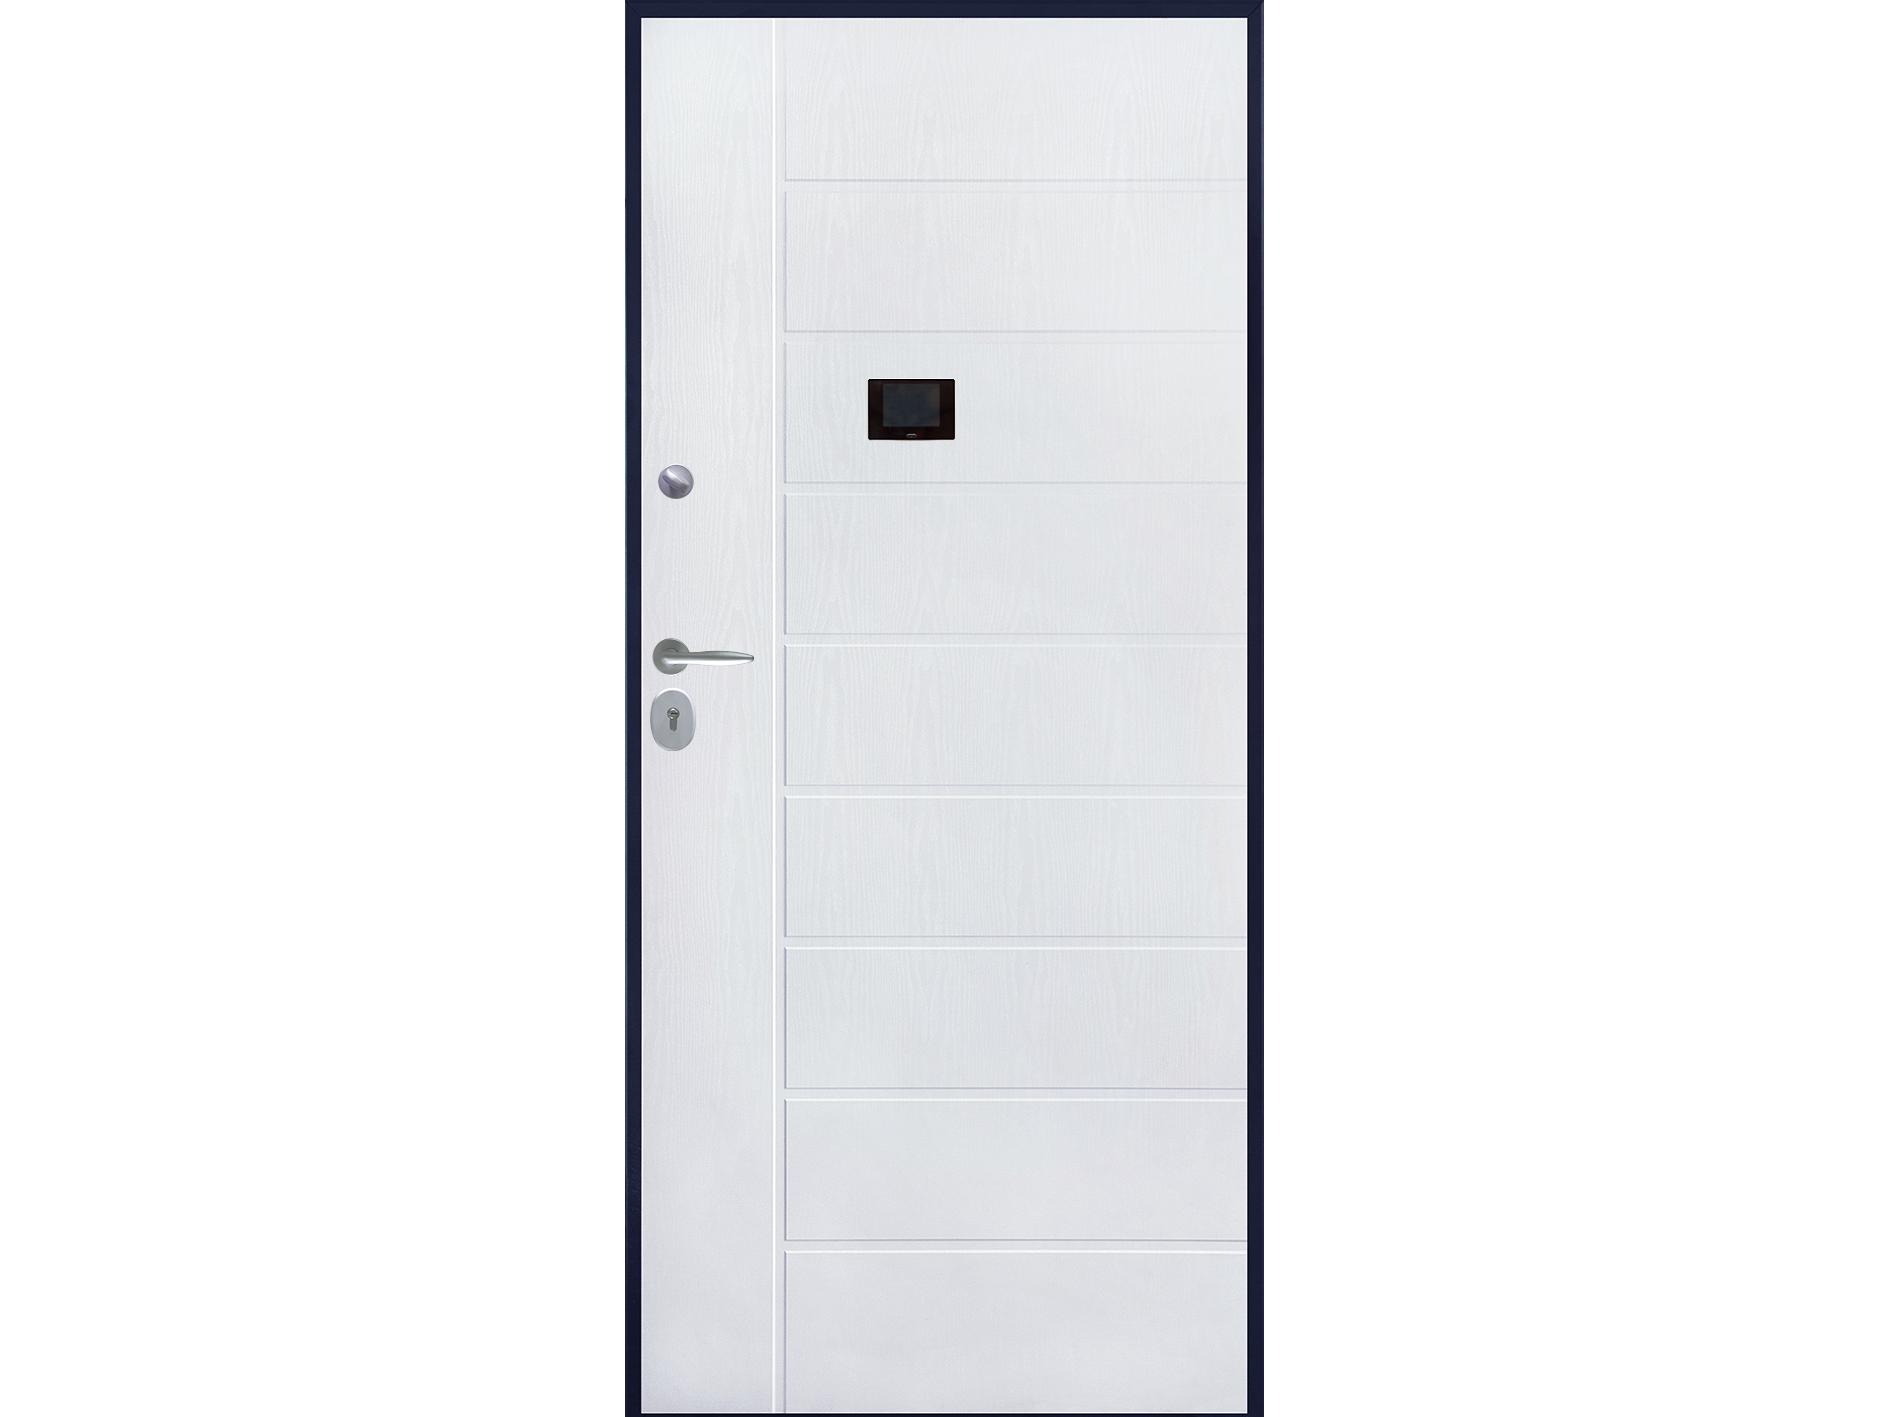 porta blindata pvc mdf bianca – Bunker Porte Blindate